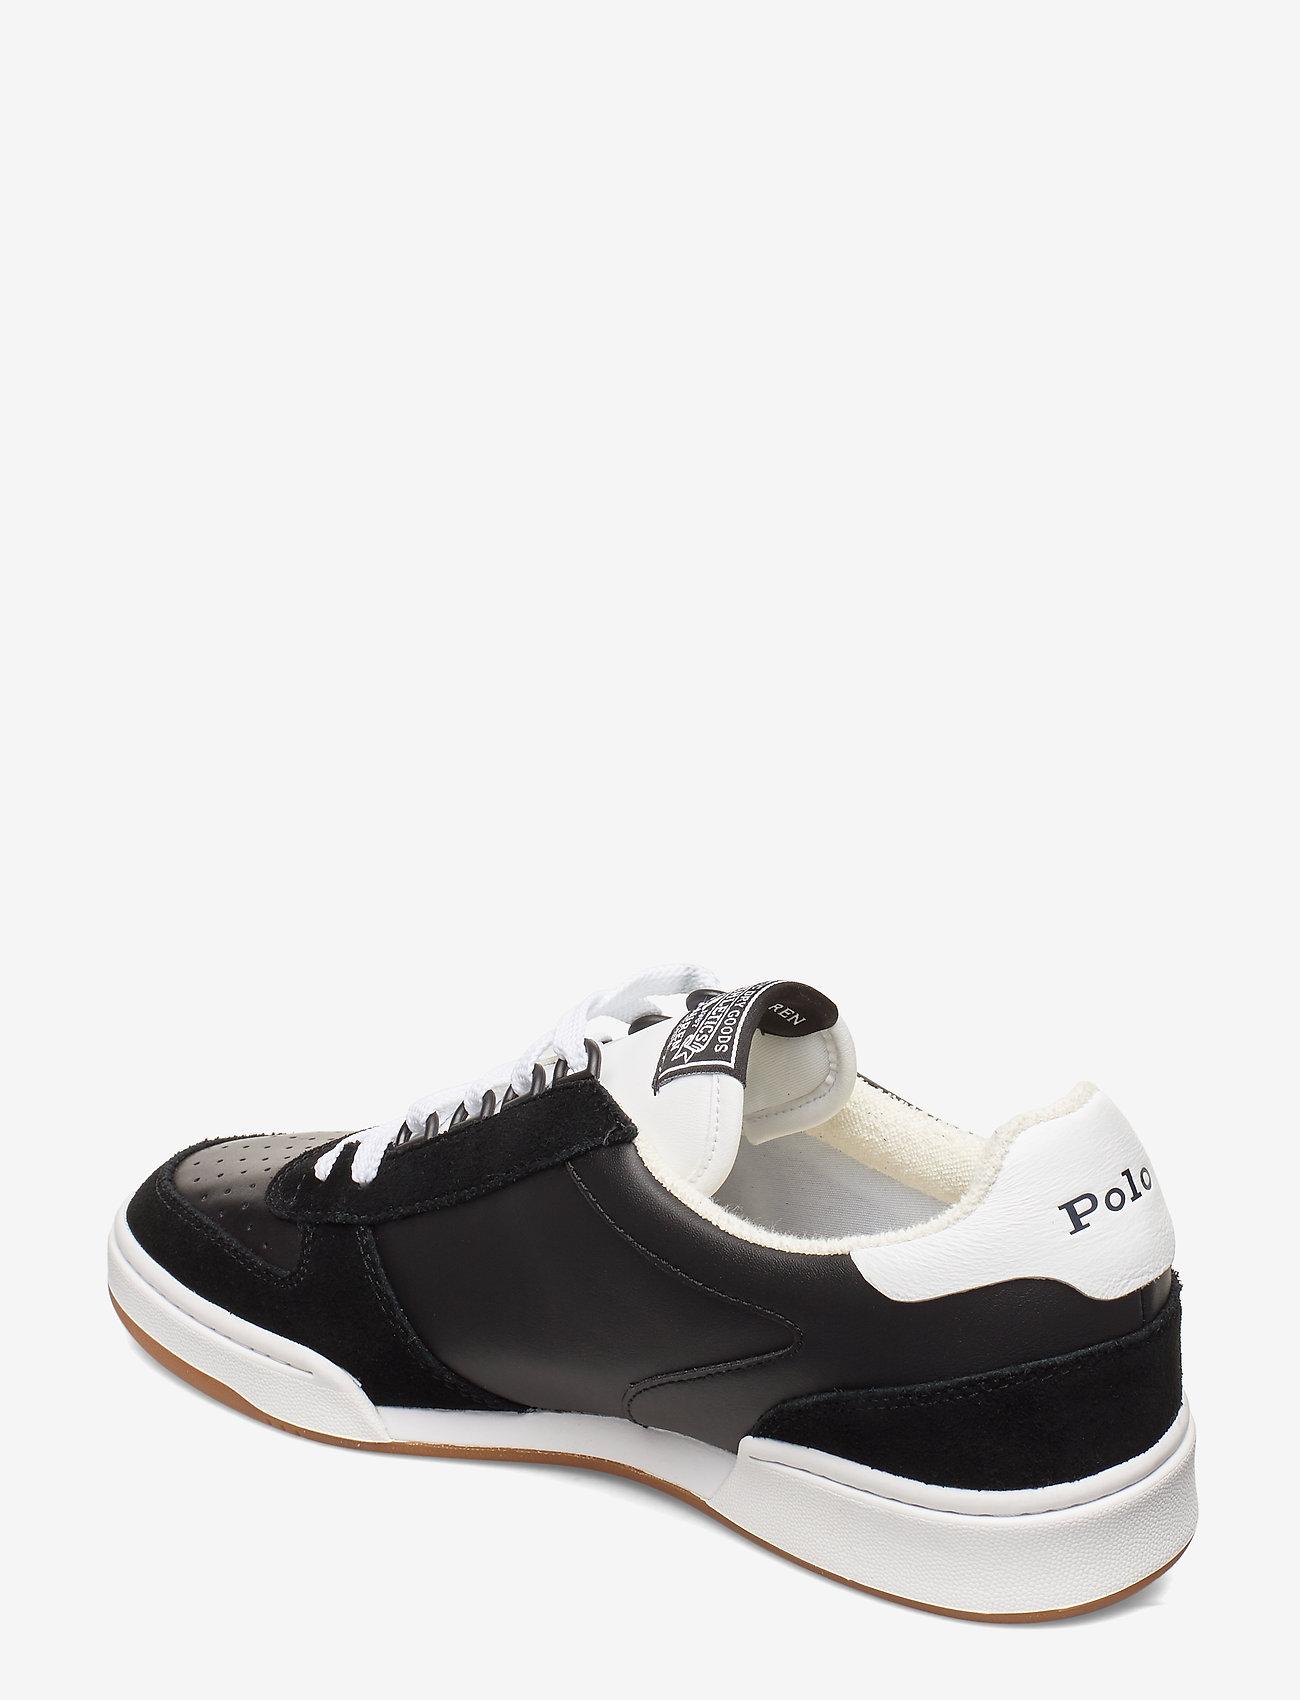 Polo Ralph Lauren Court Leather Sneaker - Sneakers BLACK/WHITE PP - Schuhe Billige